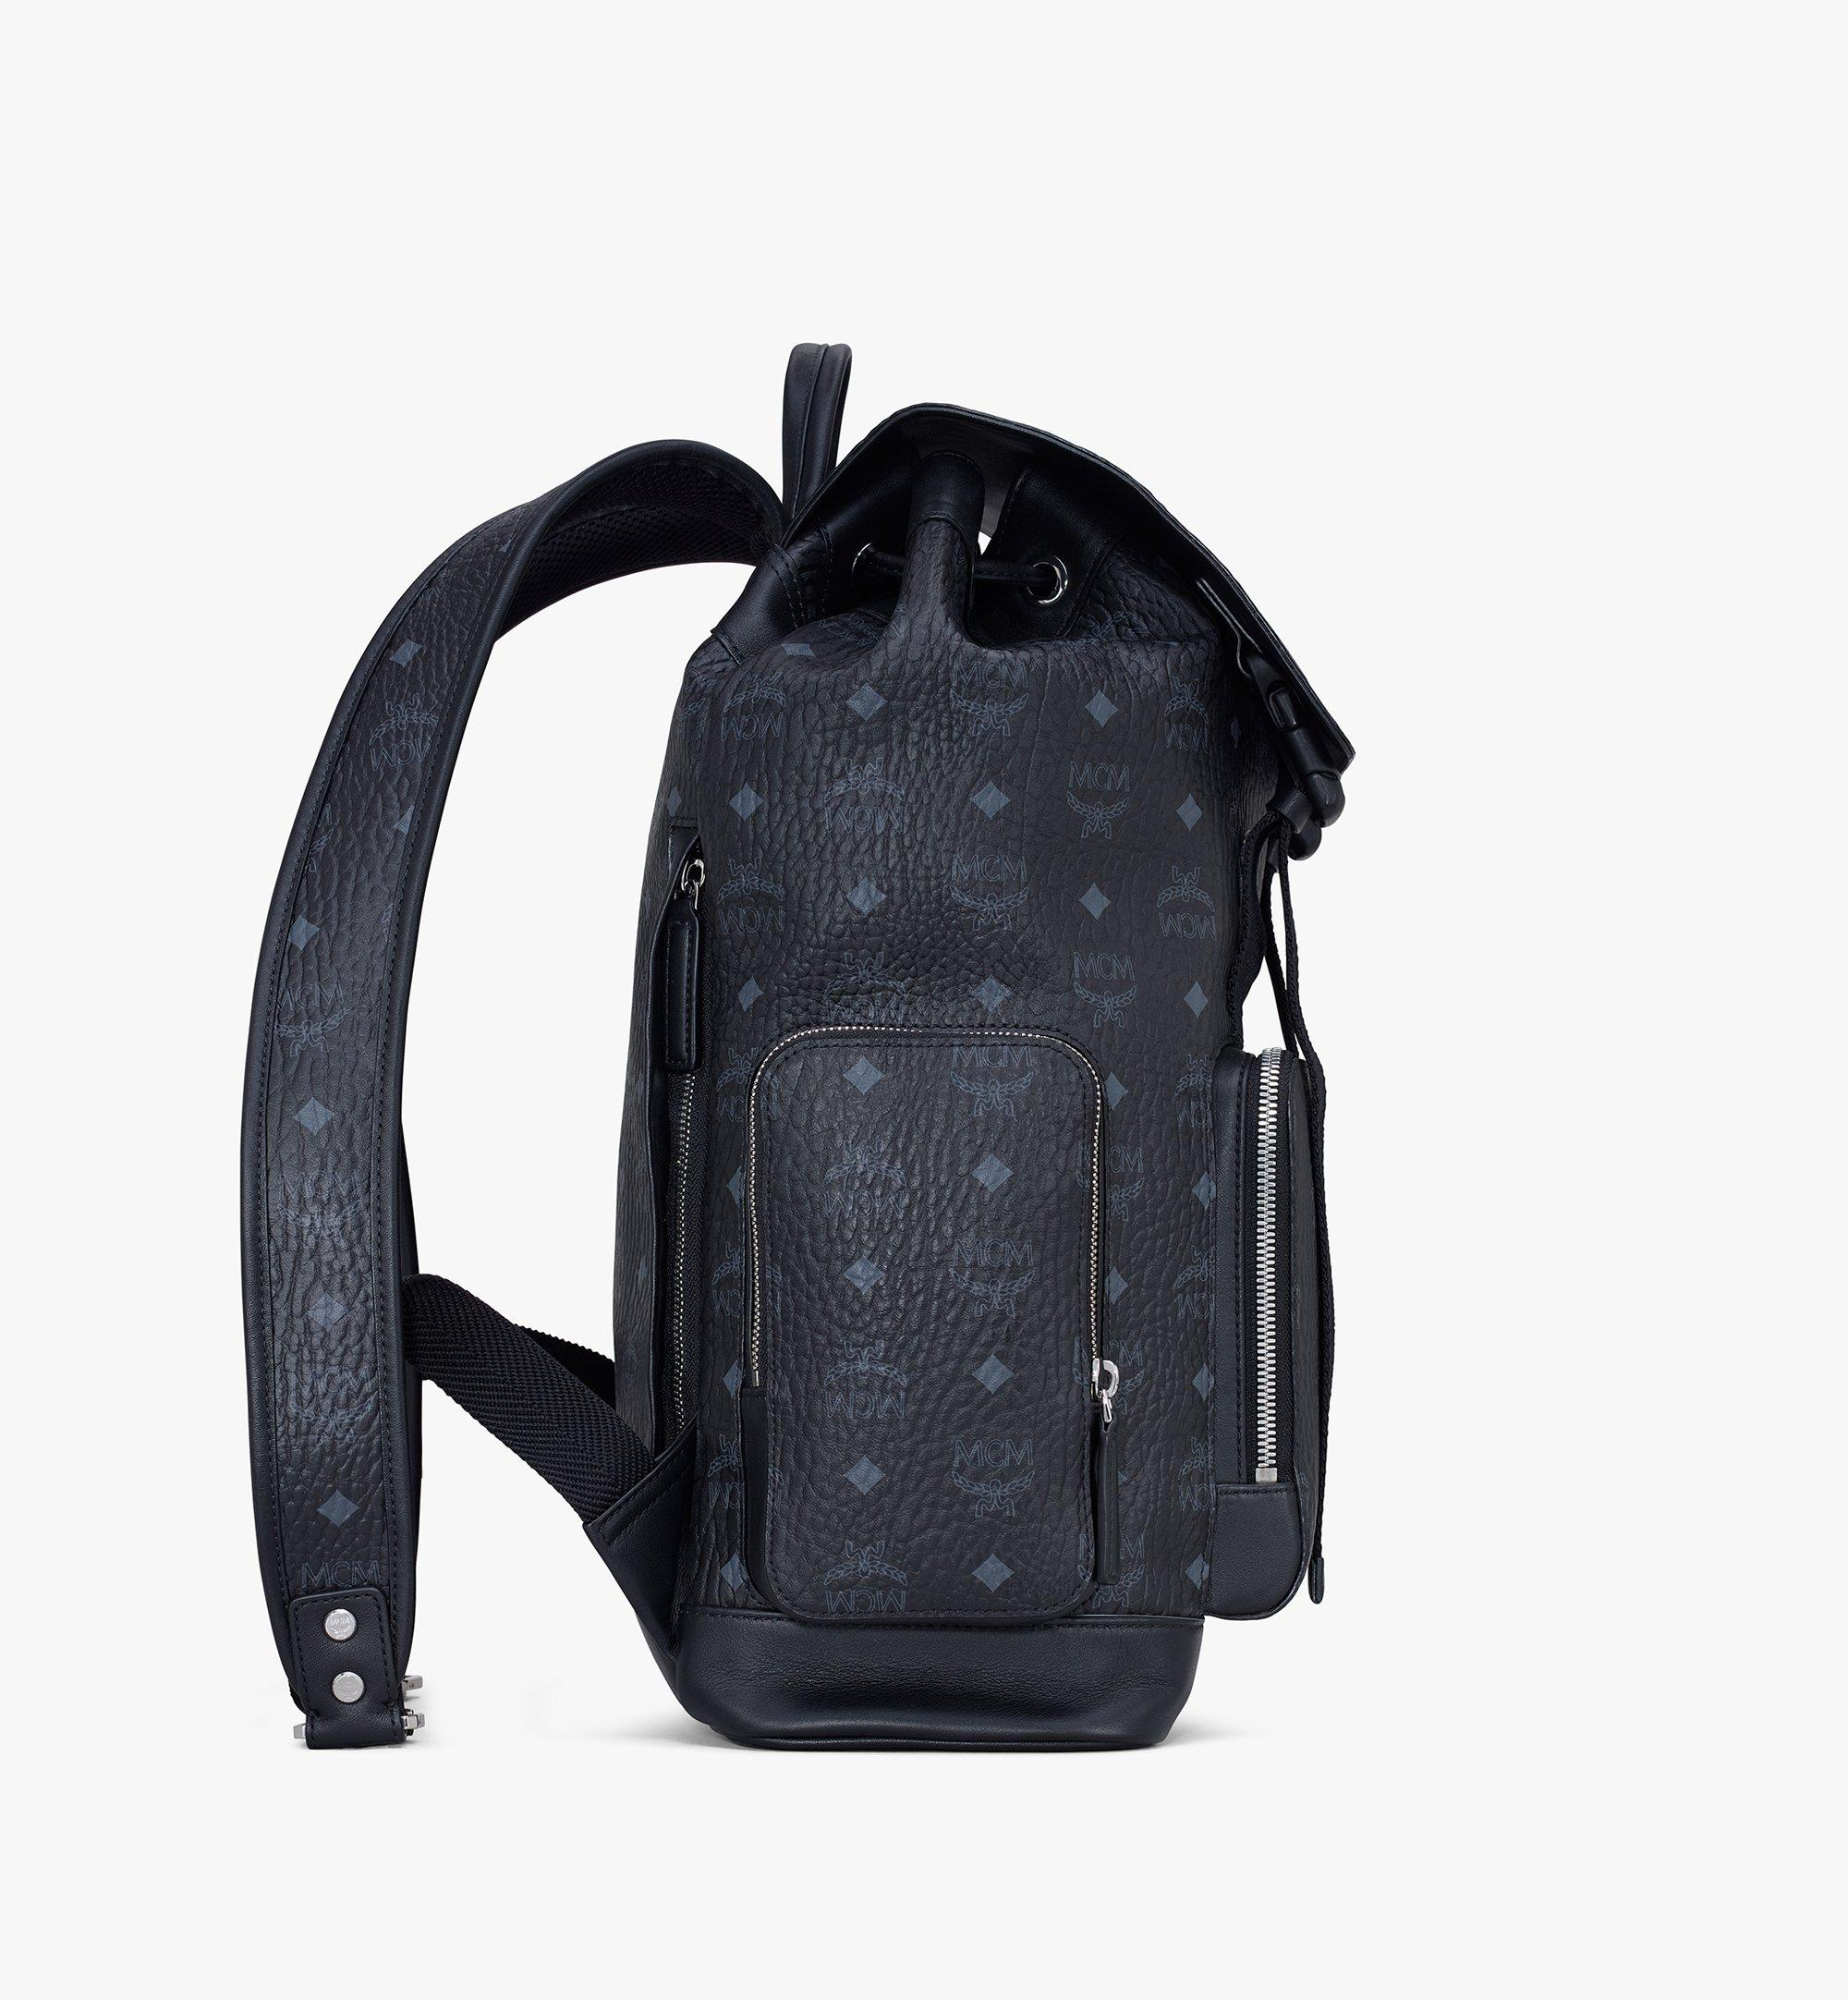 MCM Brandenburg Backpack in Visetos Black MMKASBG04BK001 Alternate View 2